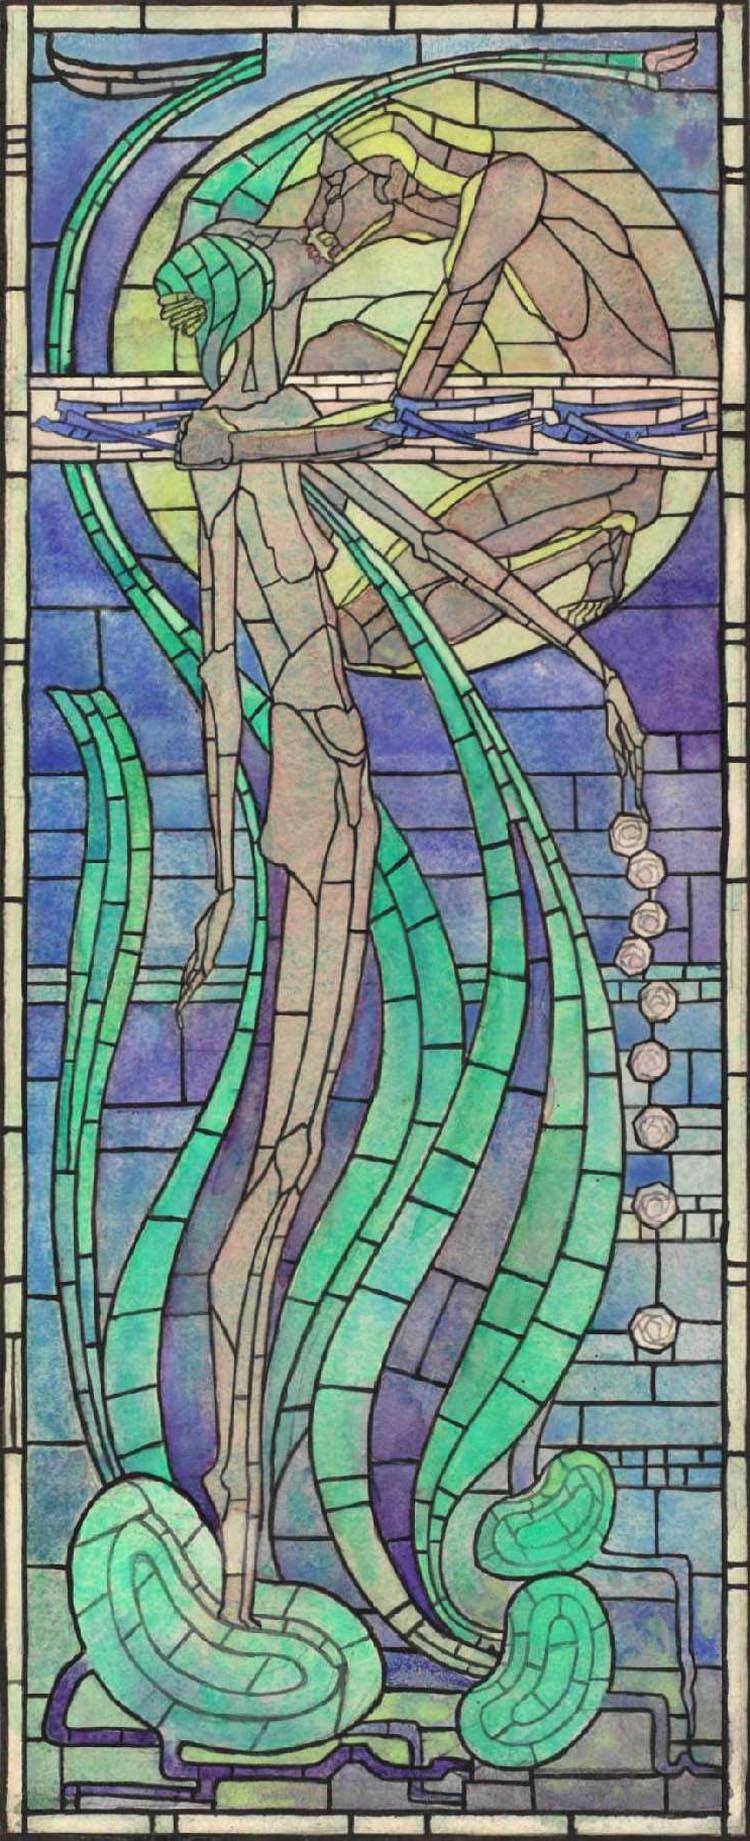 Margaret Macdonald Mackintosh,  Summer , 1894, watercolour with pen, pencil and ink on paper, 51.5 x 21.6 cm, Hunterian Art Gallery, Glasgow.   http://www.huntsearch.gla.ac.uk/cgi-bin/foxweb/huntsearch_Mackintosh/DetailedResults.fwx?SearchTerm=41047&reqMethod=Link